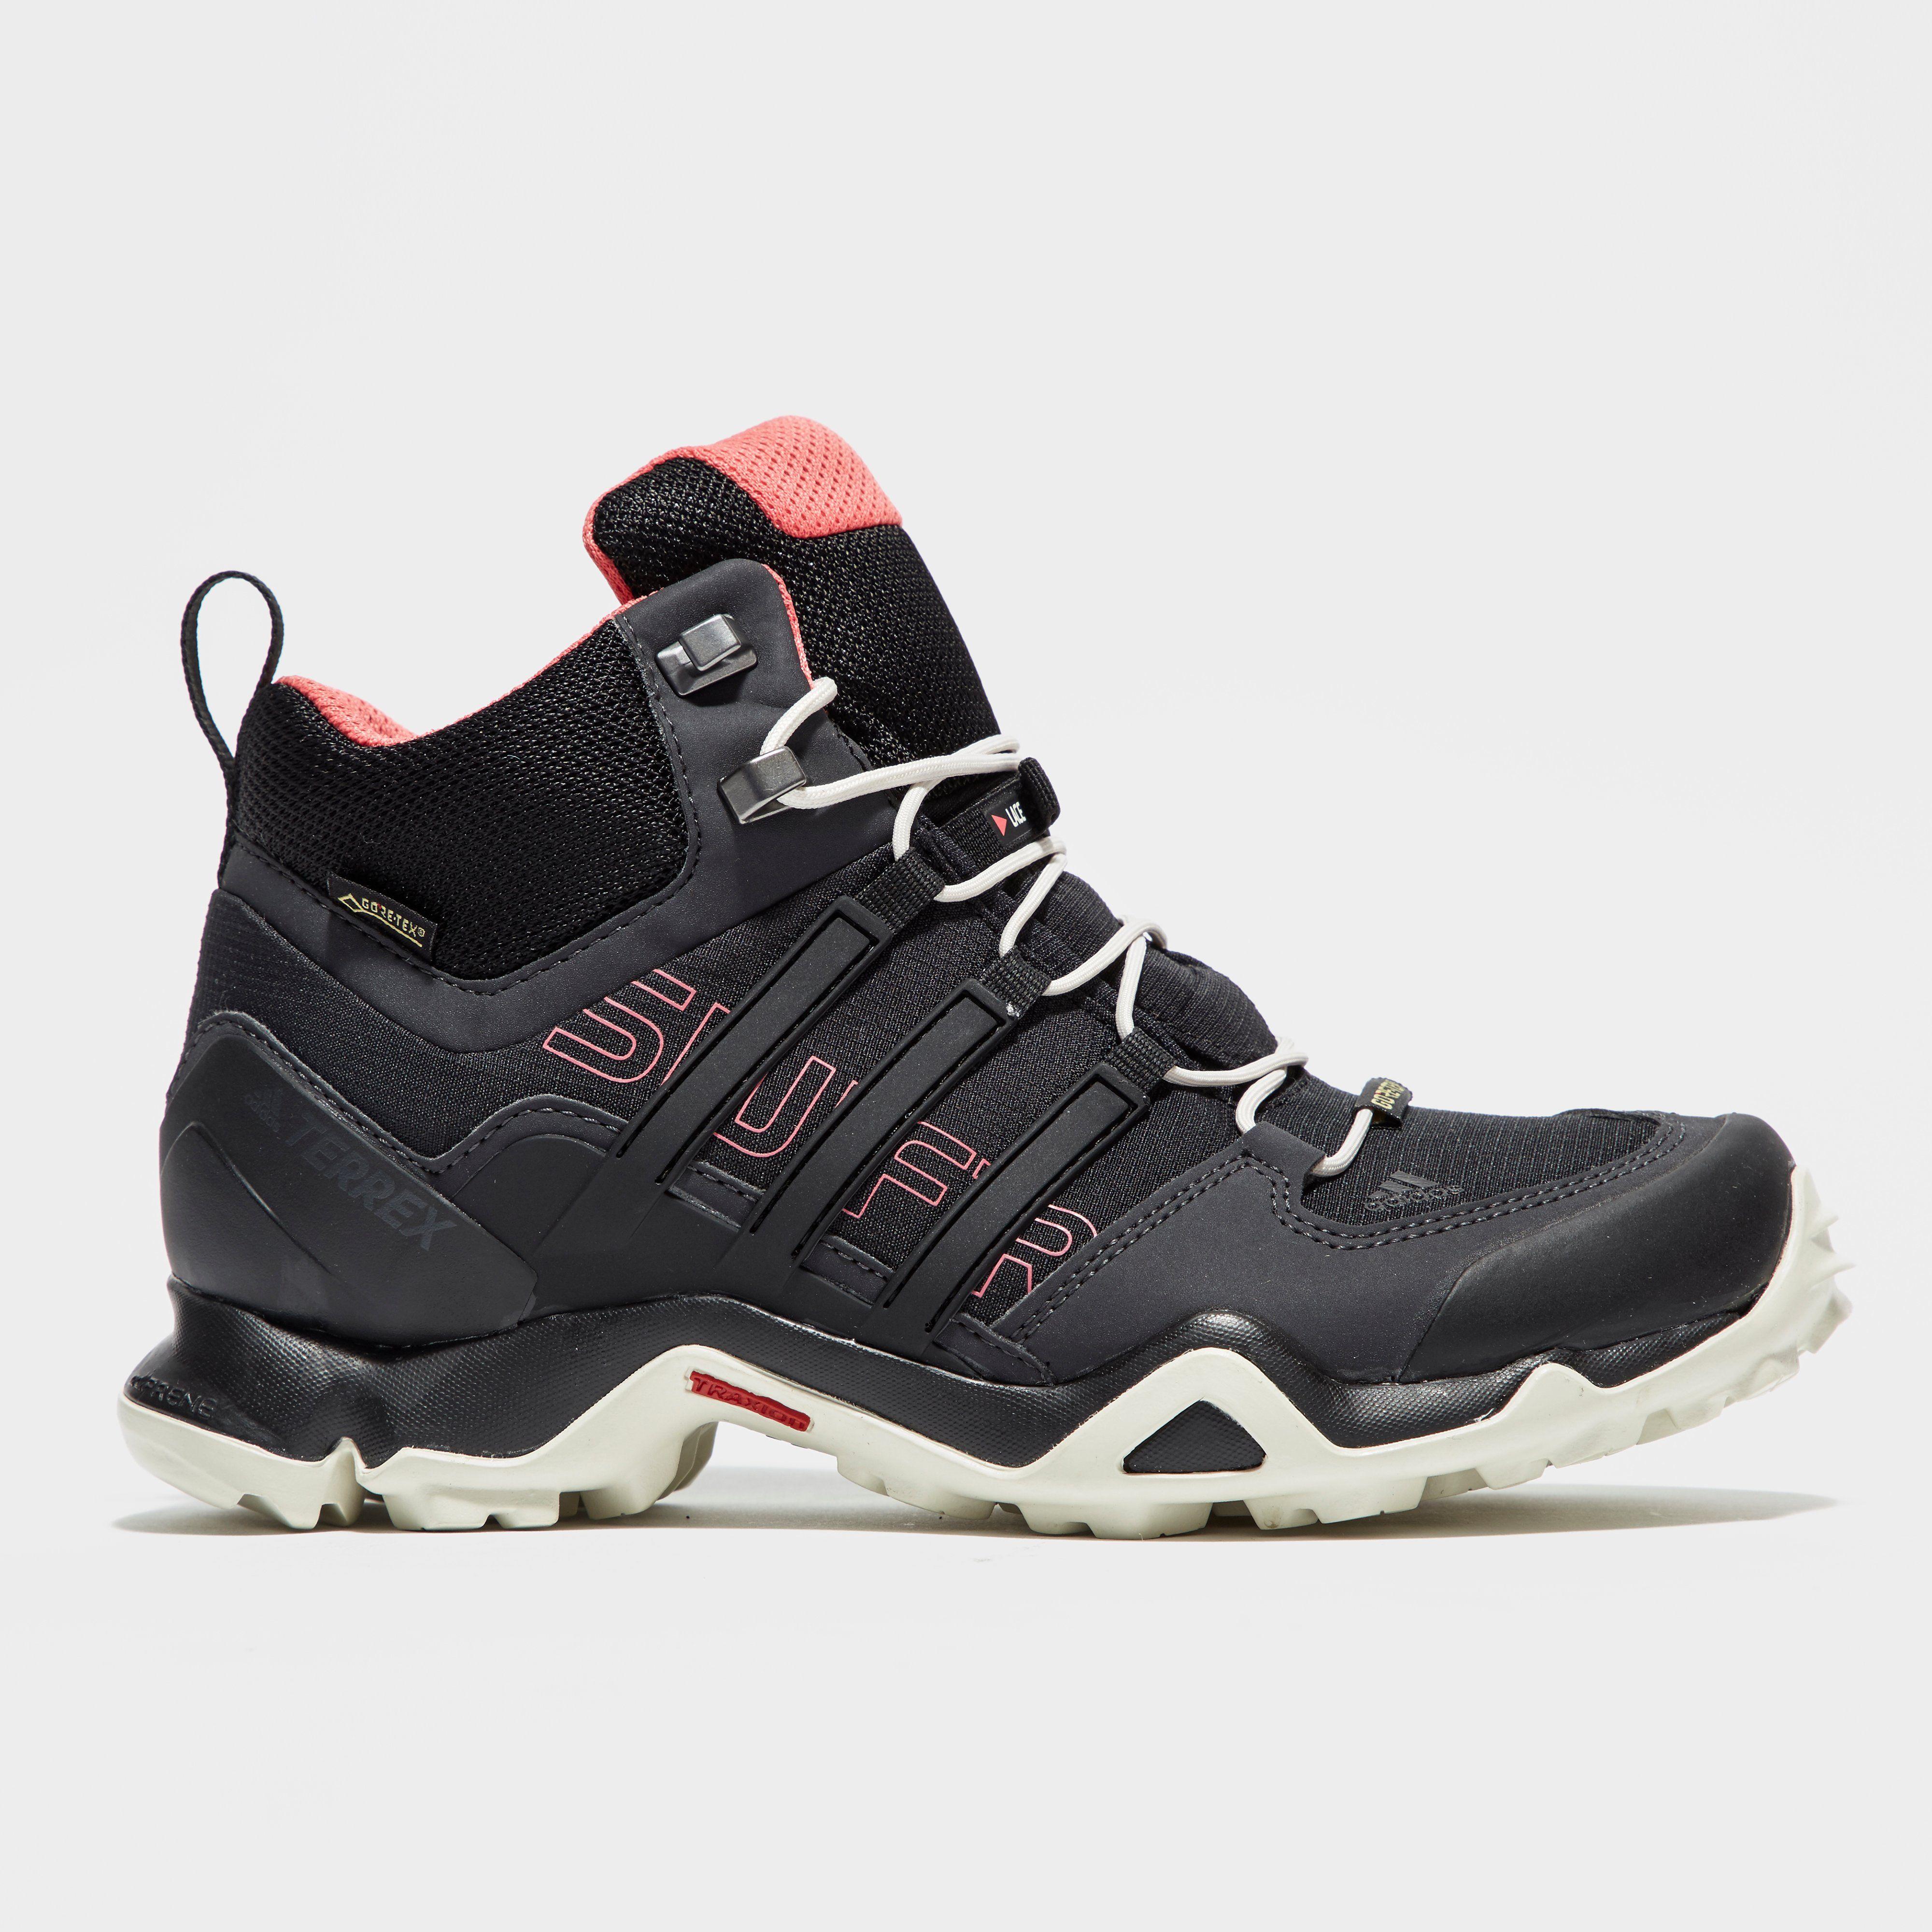 ADIDAS Women's Terrex Swift R GORE-TEX® Mid Boots